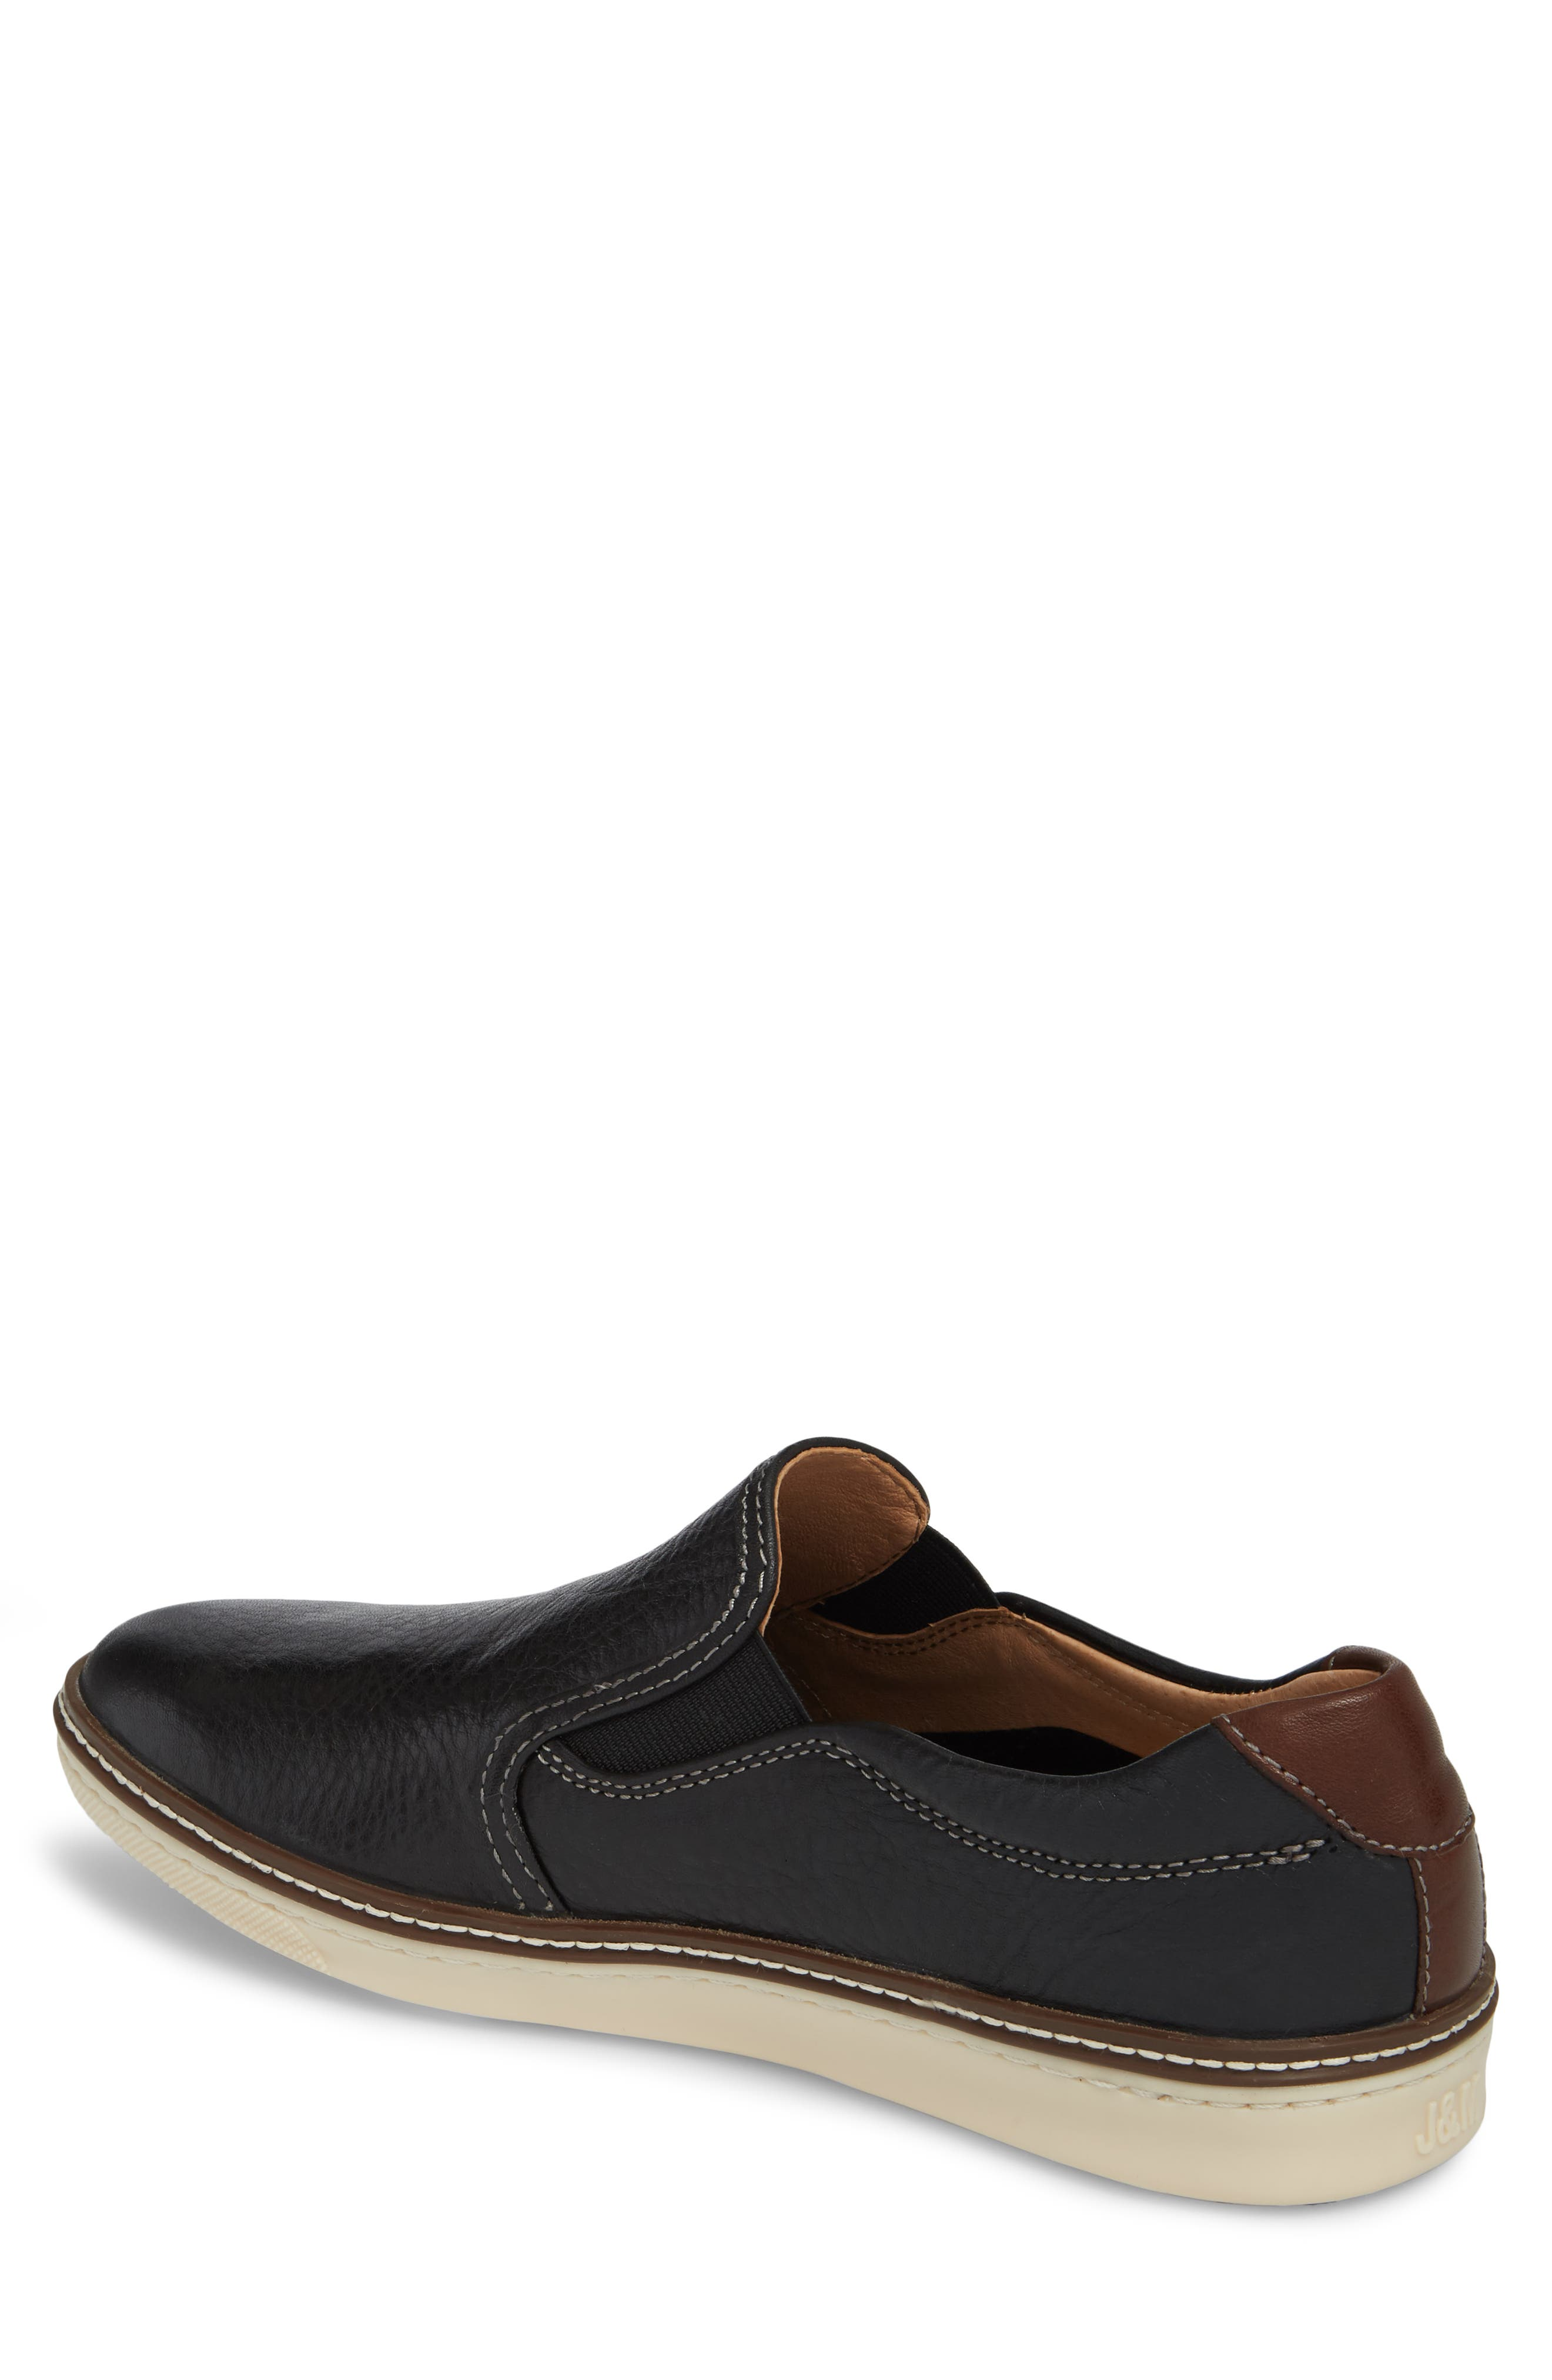 McGuffey Slip-On Sneaker,                             Alternate thumbnail 2, color,                             Black Leather